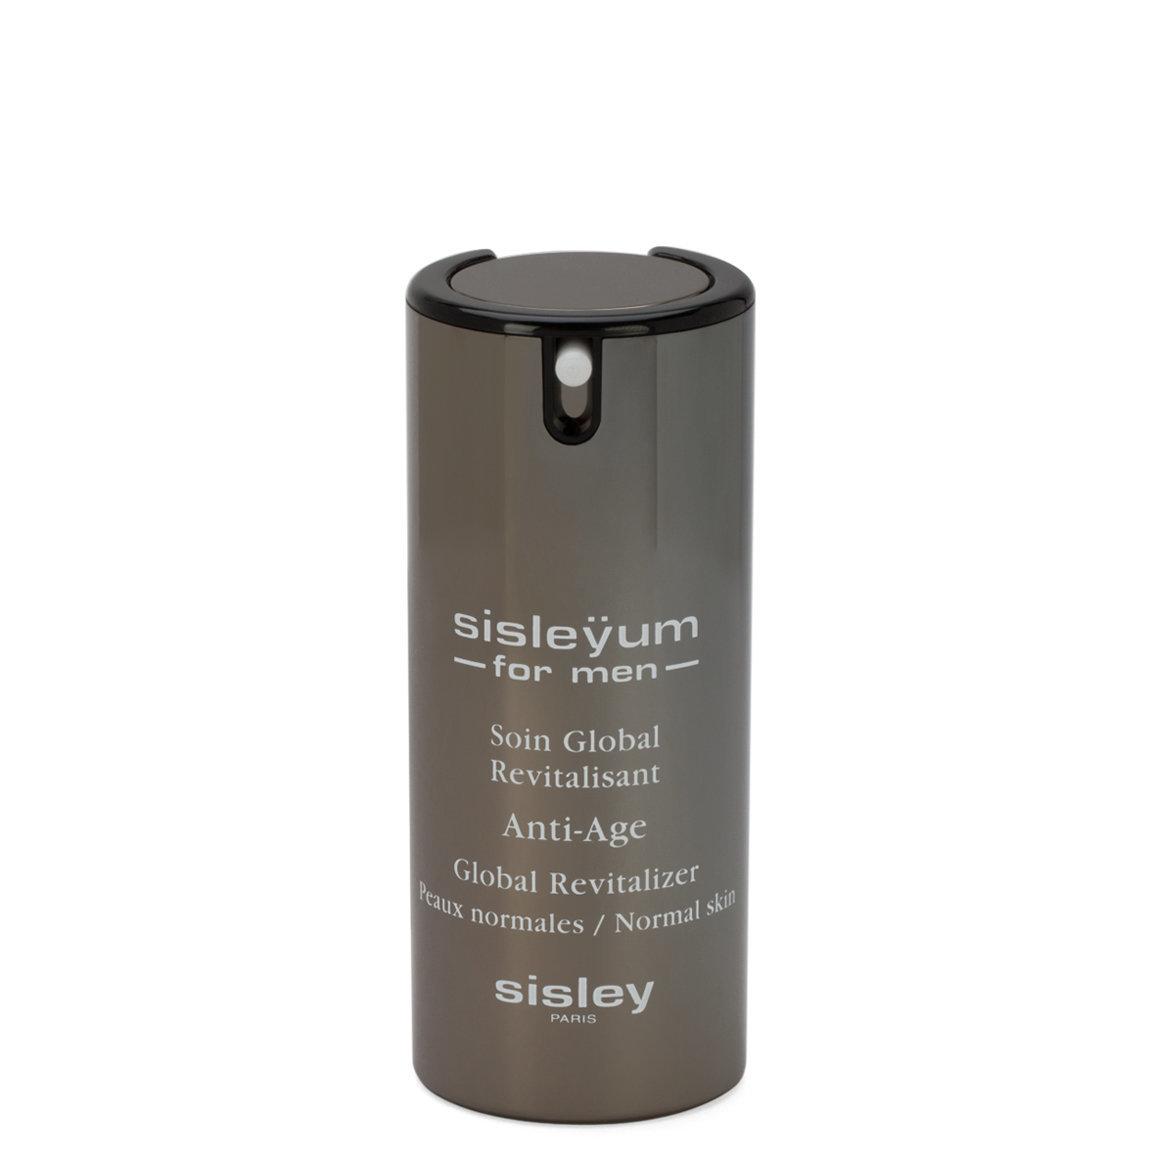 Sisley-Paris Sisleÿum for Men (Normal) alternative view 1 - product swatch.